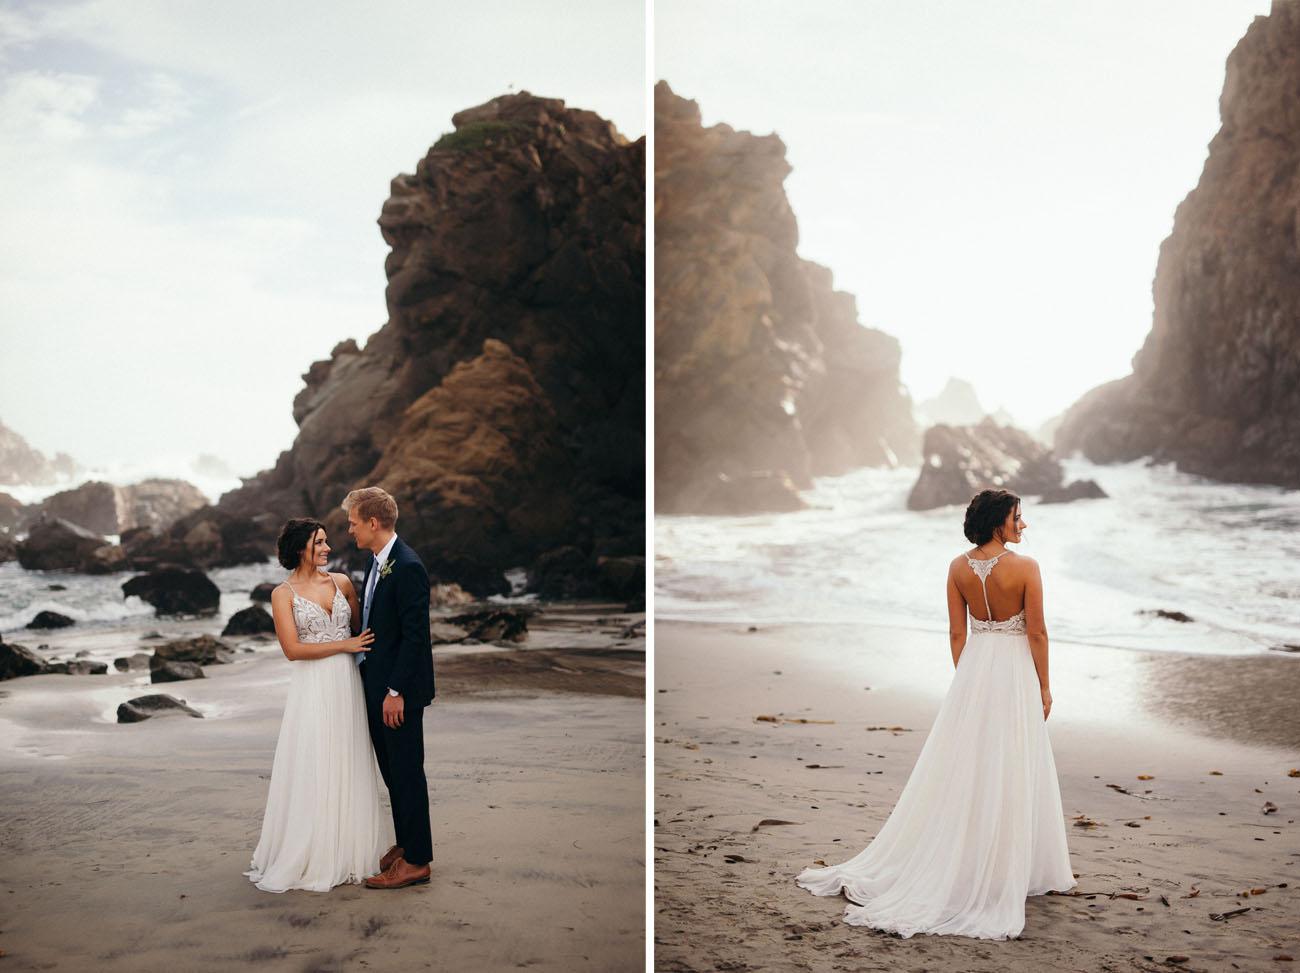 Eric peiffer wedding